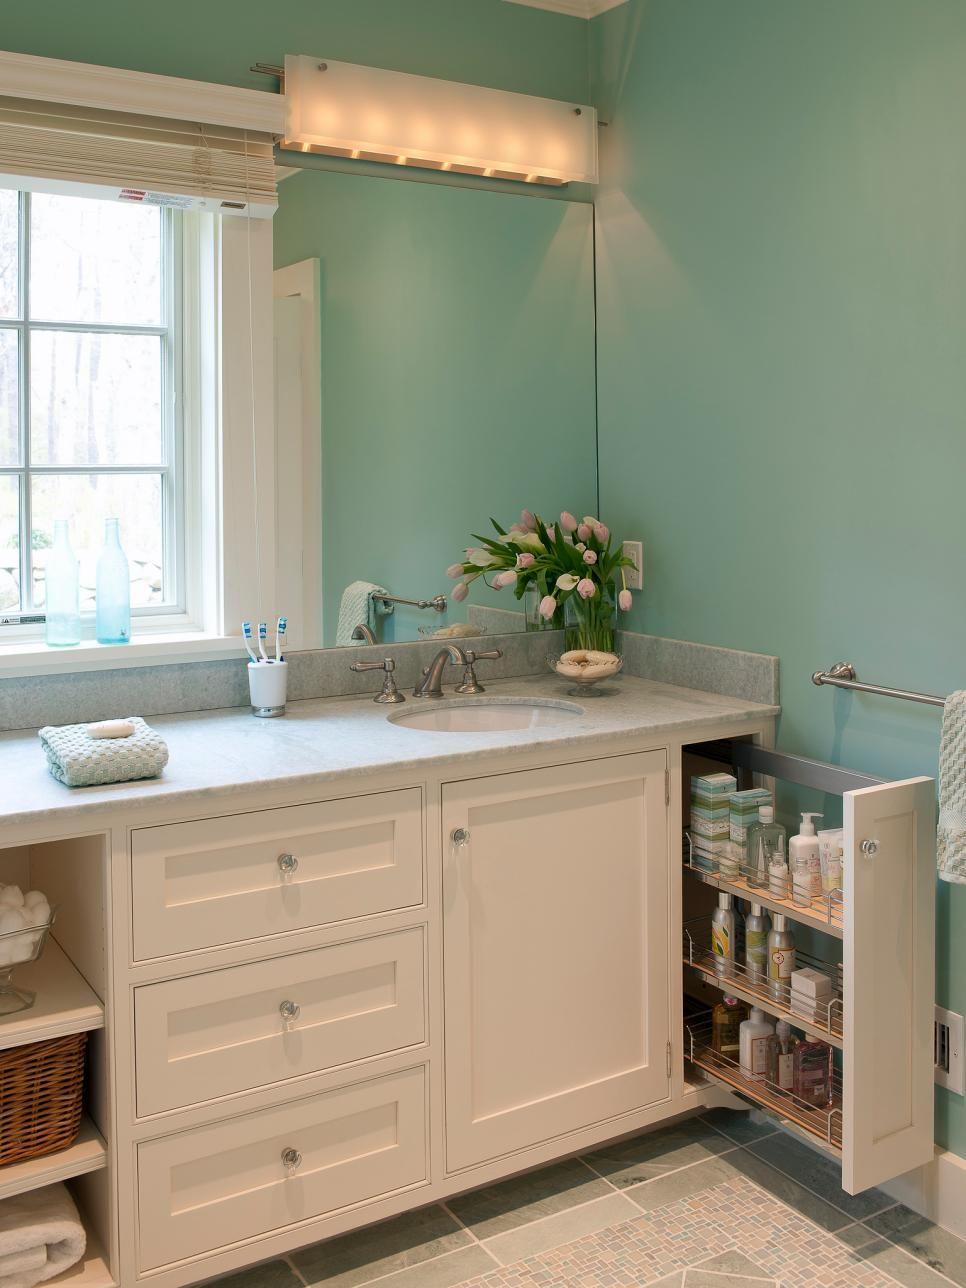 15 Smart Bath Storage Ideas Bathroom Vanity Storage Bathroom Vanity Bathroom Vanity Organization